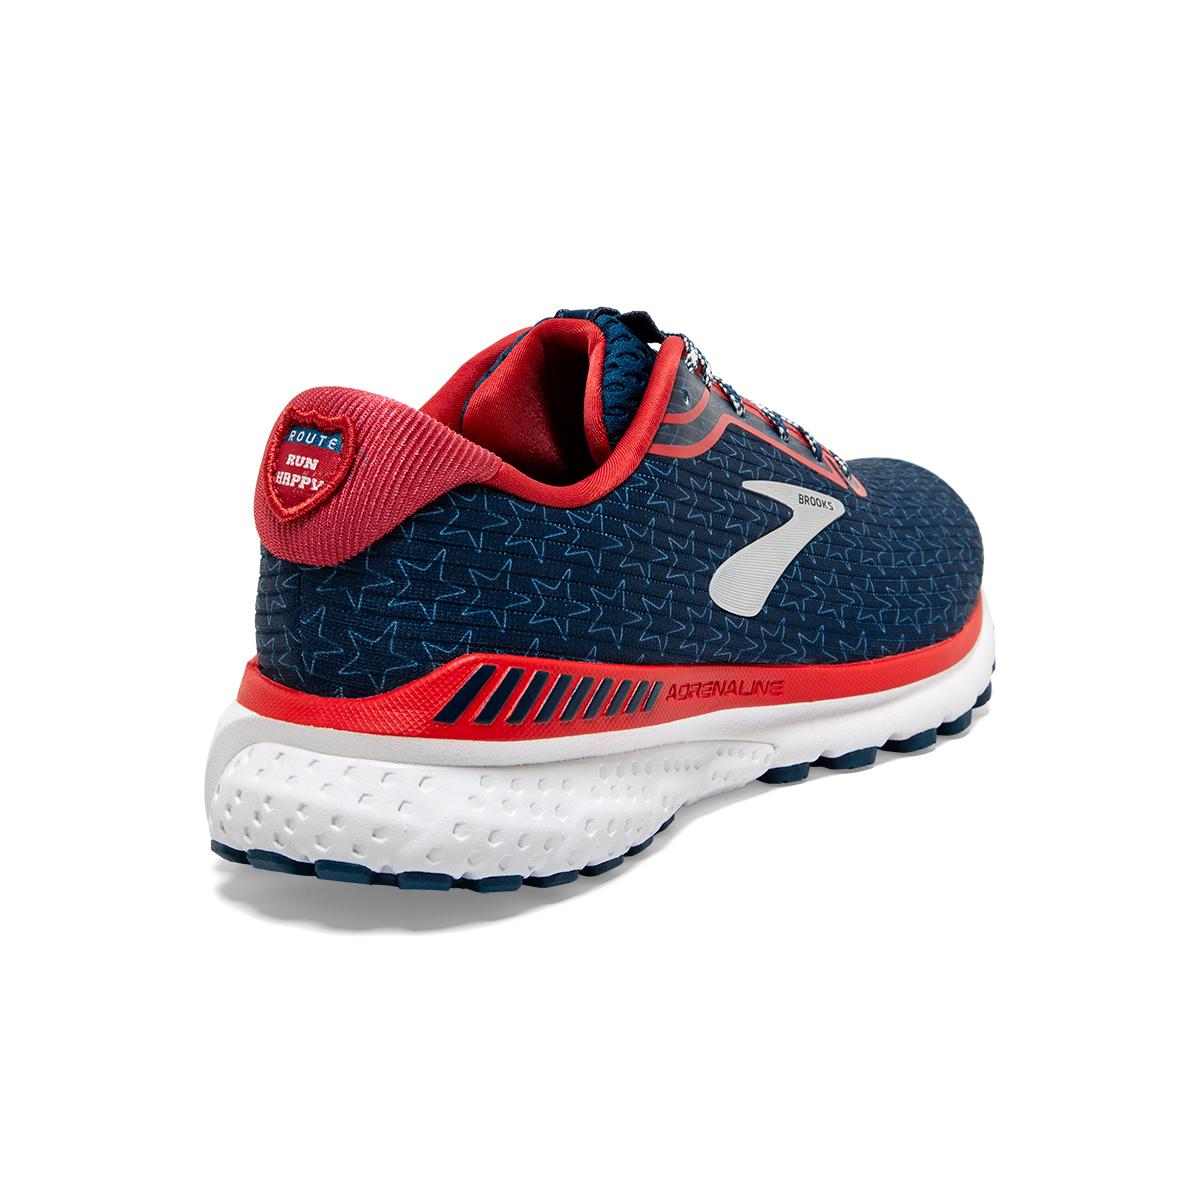 Men's Brooks Adrenaline GTS 20 Running Shoe - Color: Gibraltar/Red/White - Size: 7 - Width: Regular, Gibraltar/Red/White, large, image 4